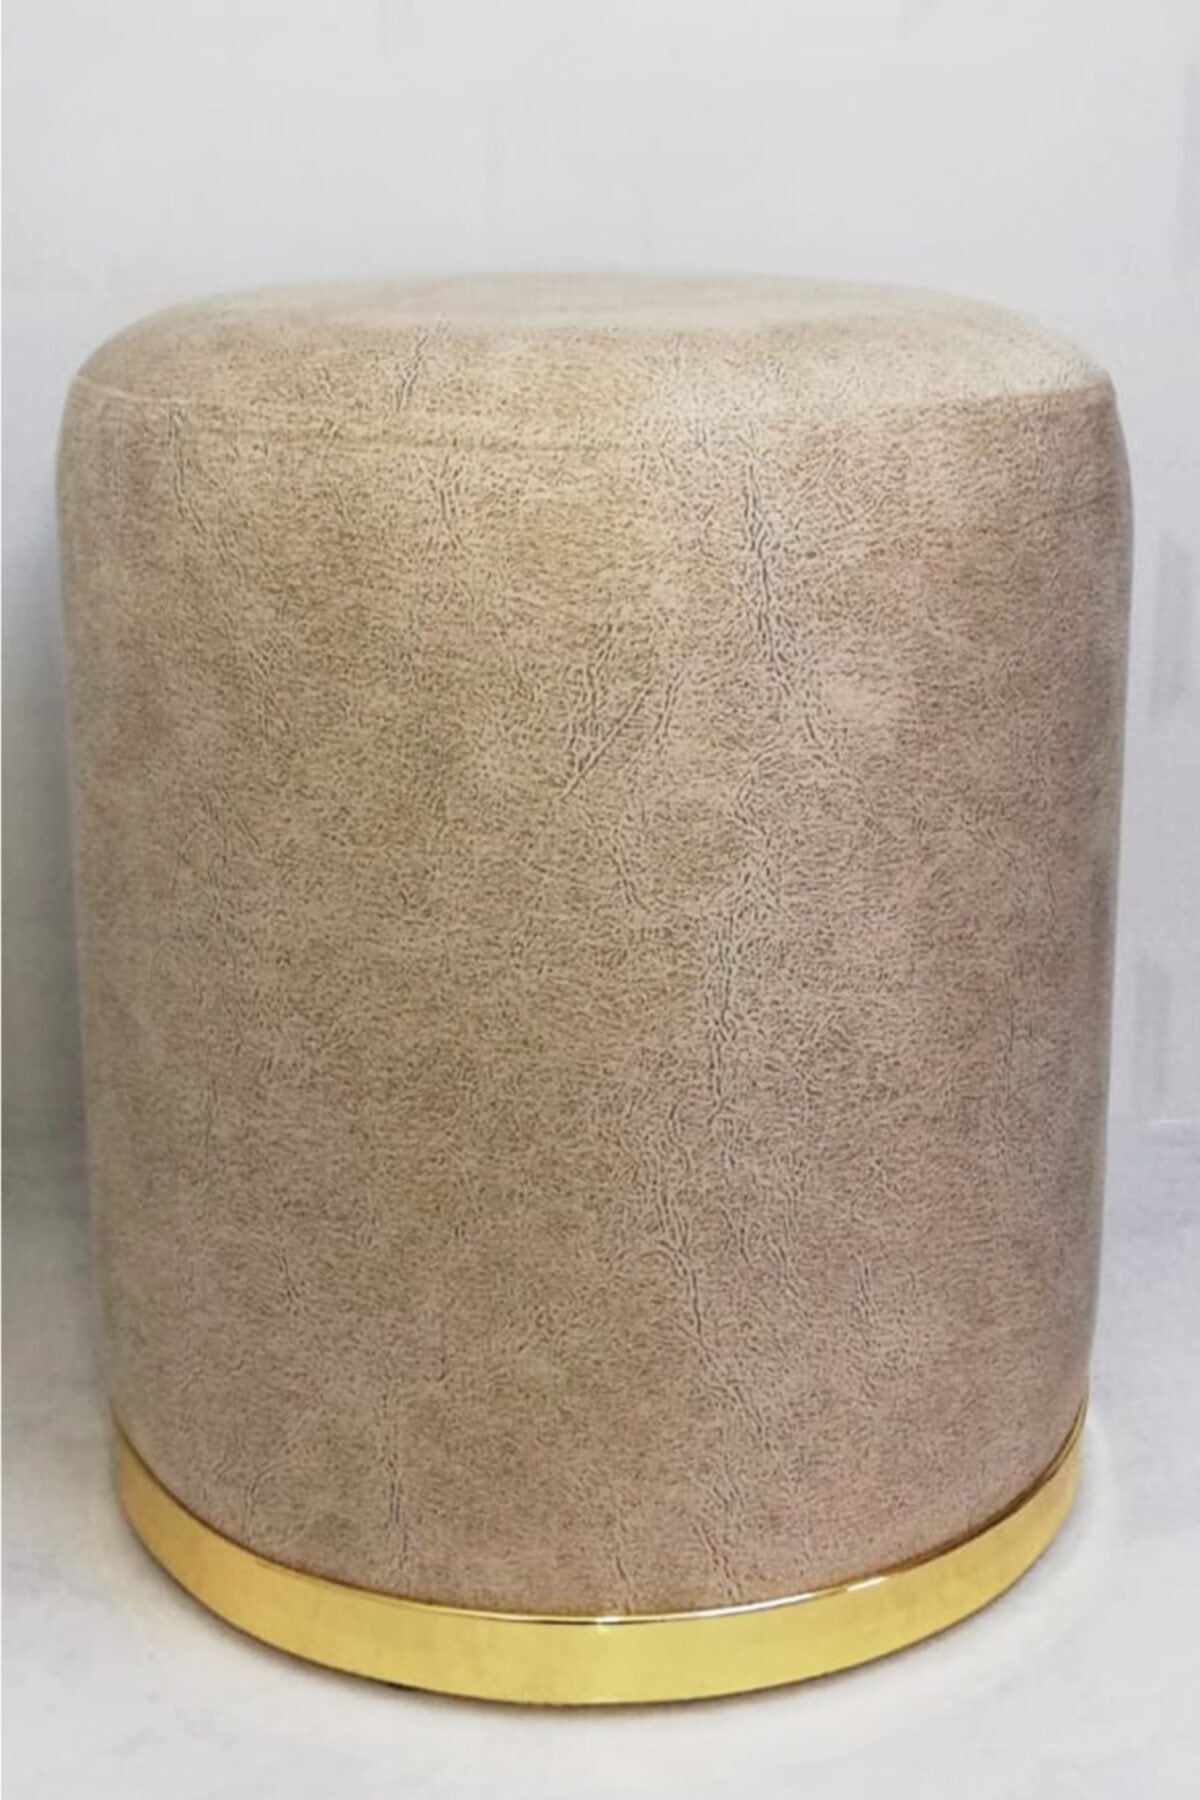 Zem Nora Silinebilir Puf - Cream Gold 2